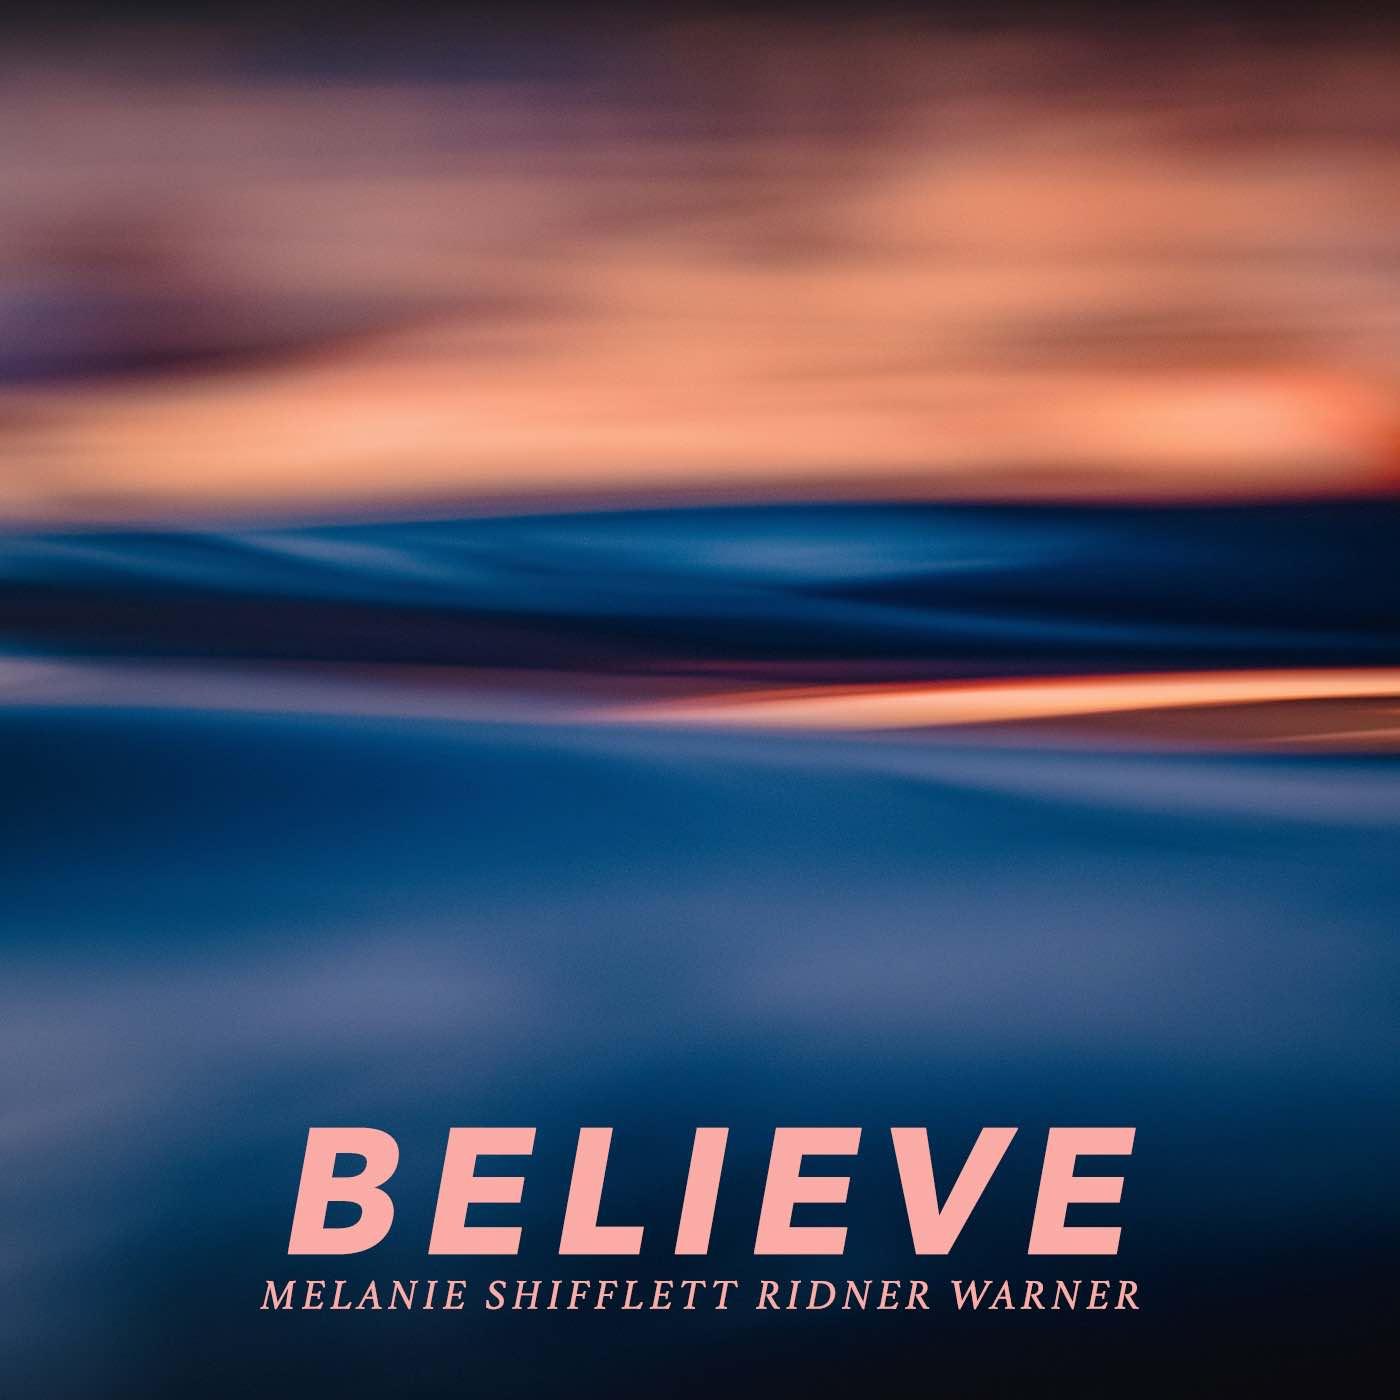 Believe-Melanie-Shifflett-Ridner-Warner